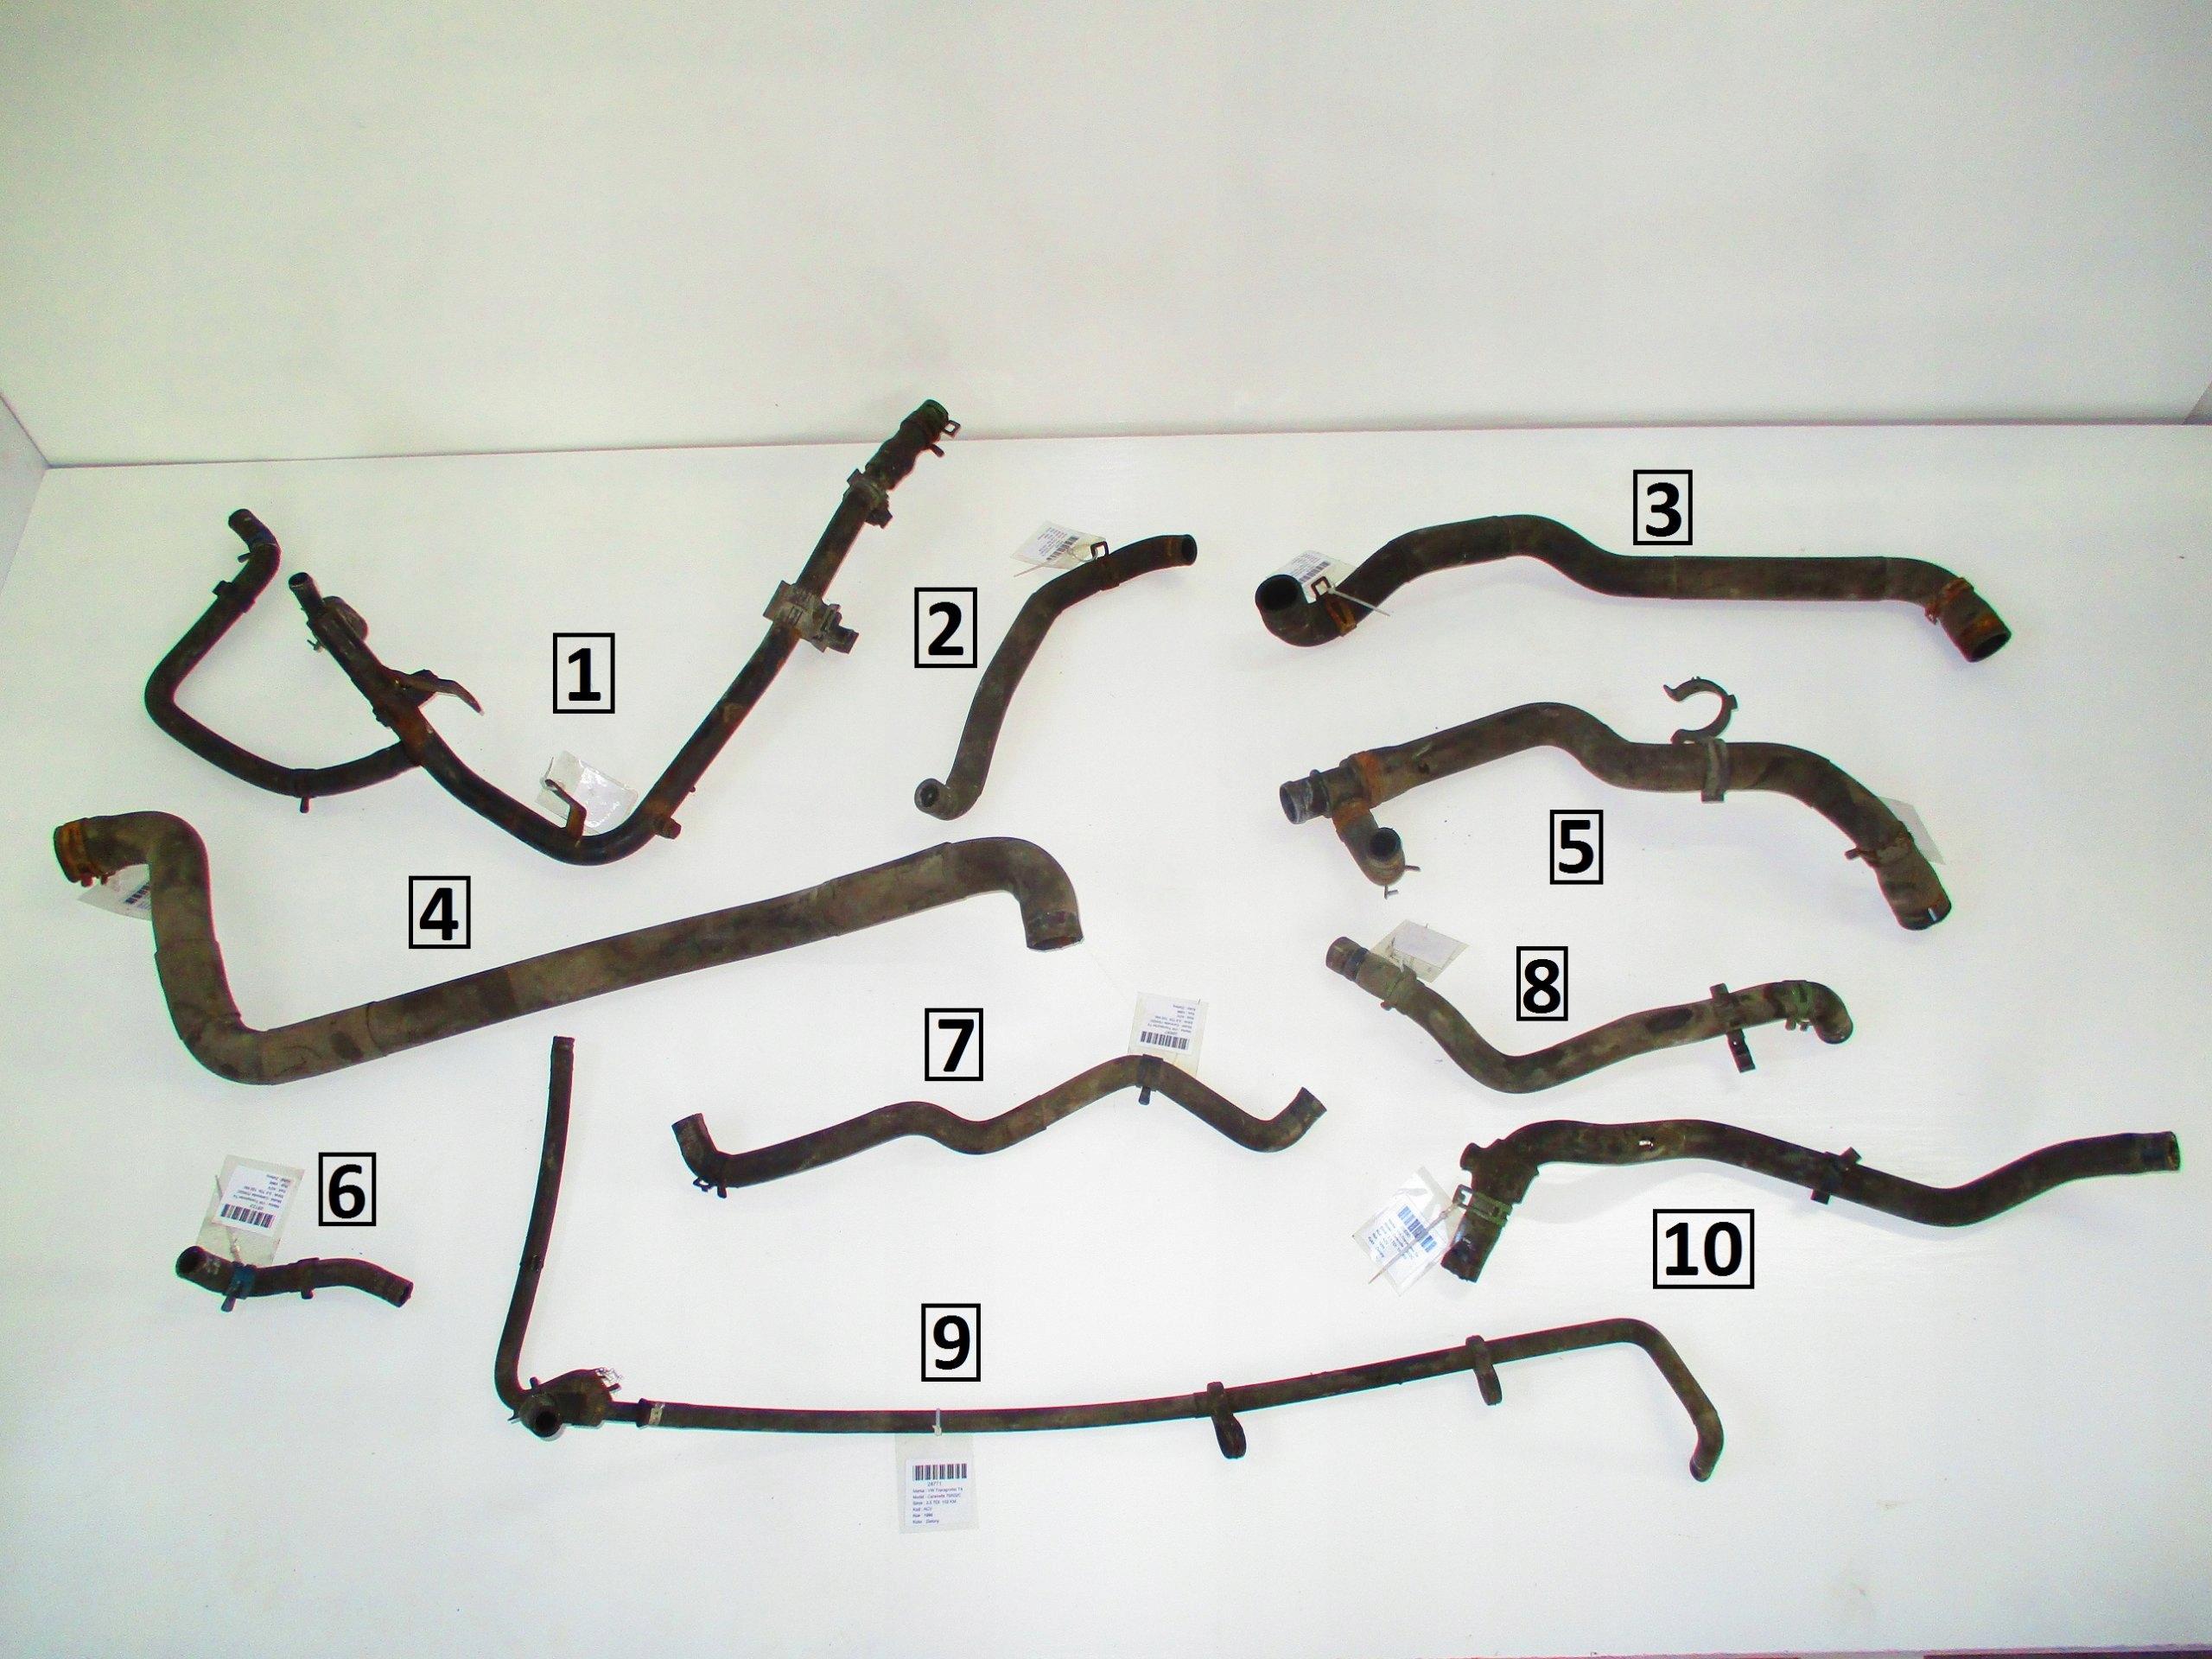 vw t4 25 tdi 95-03 шланг кабель воды крк